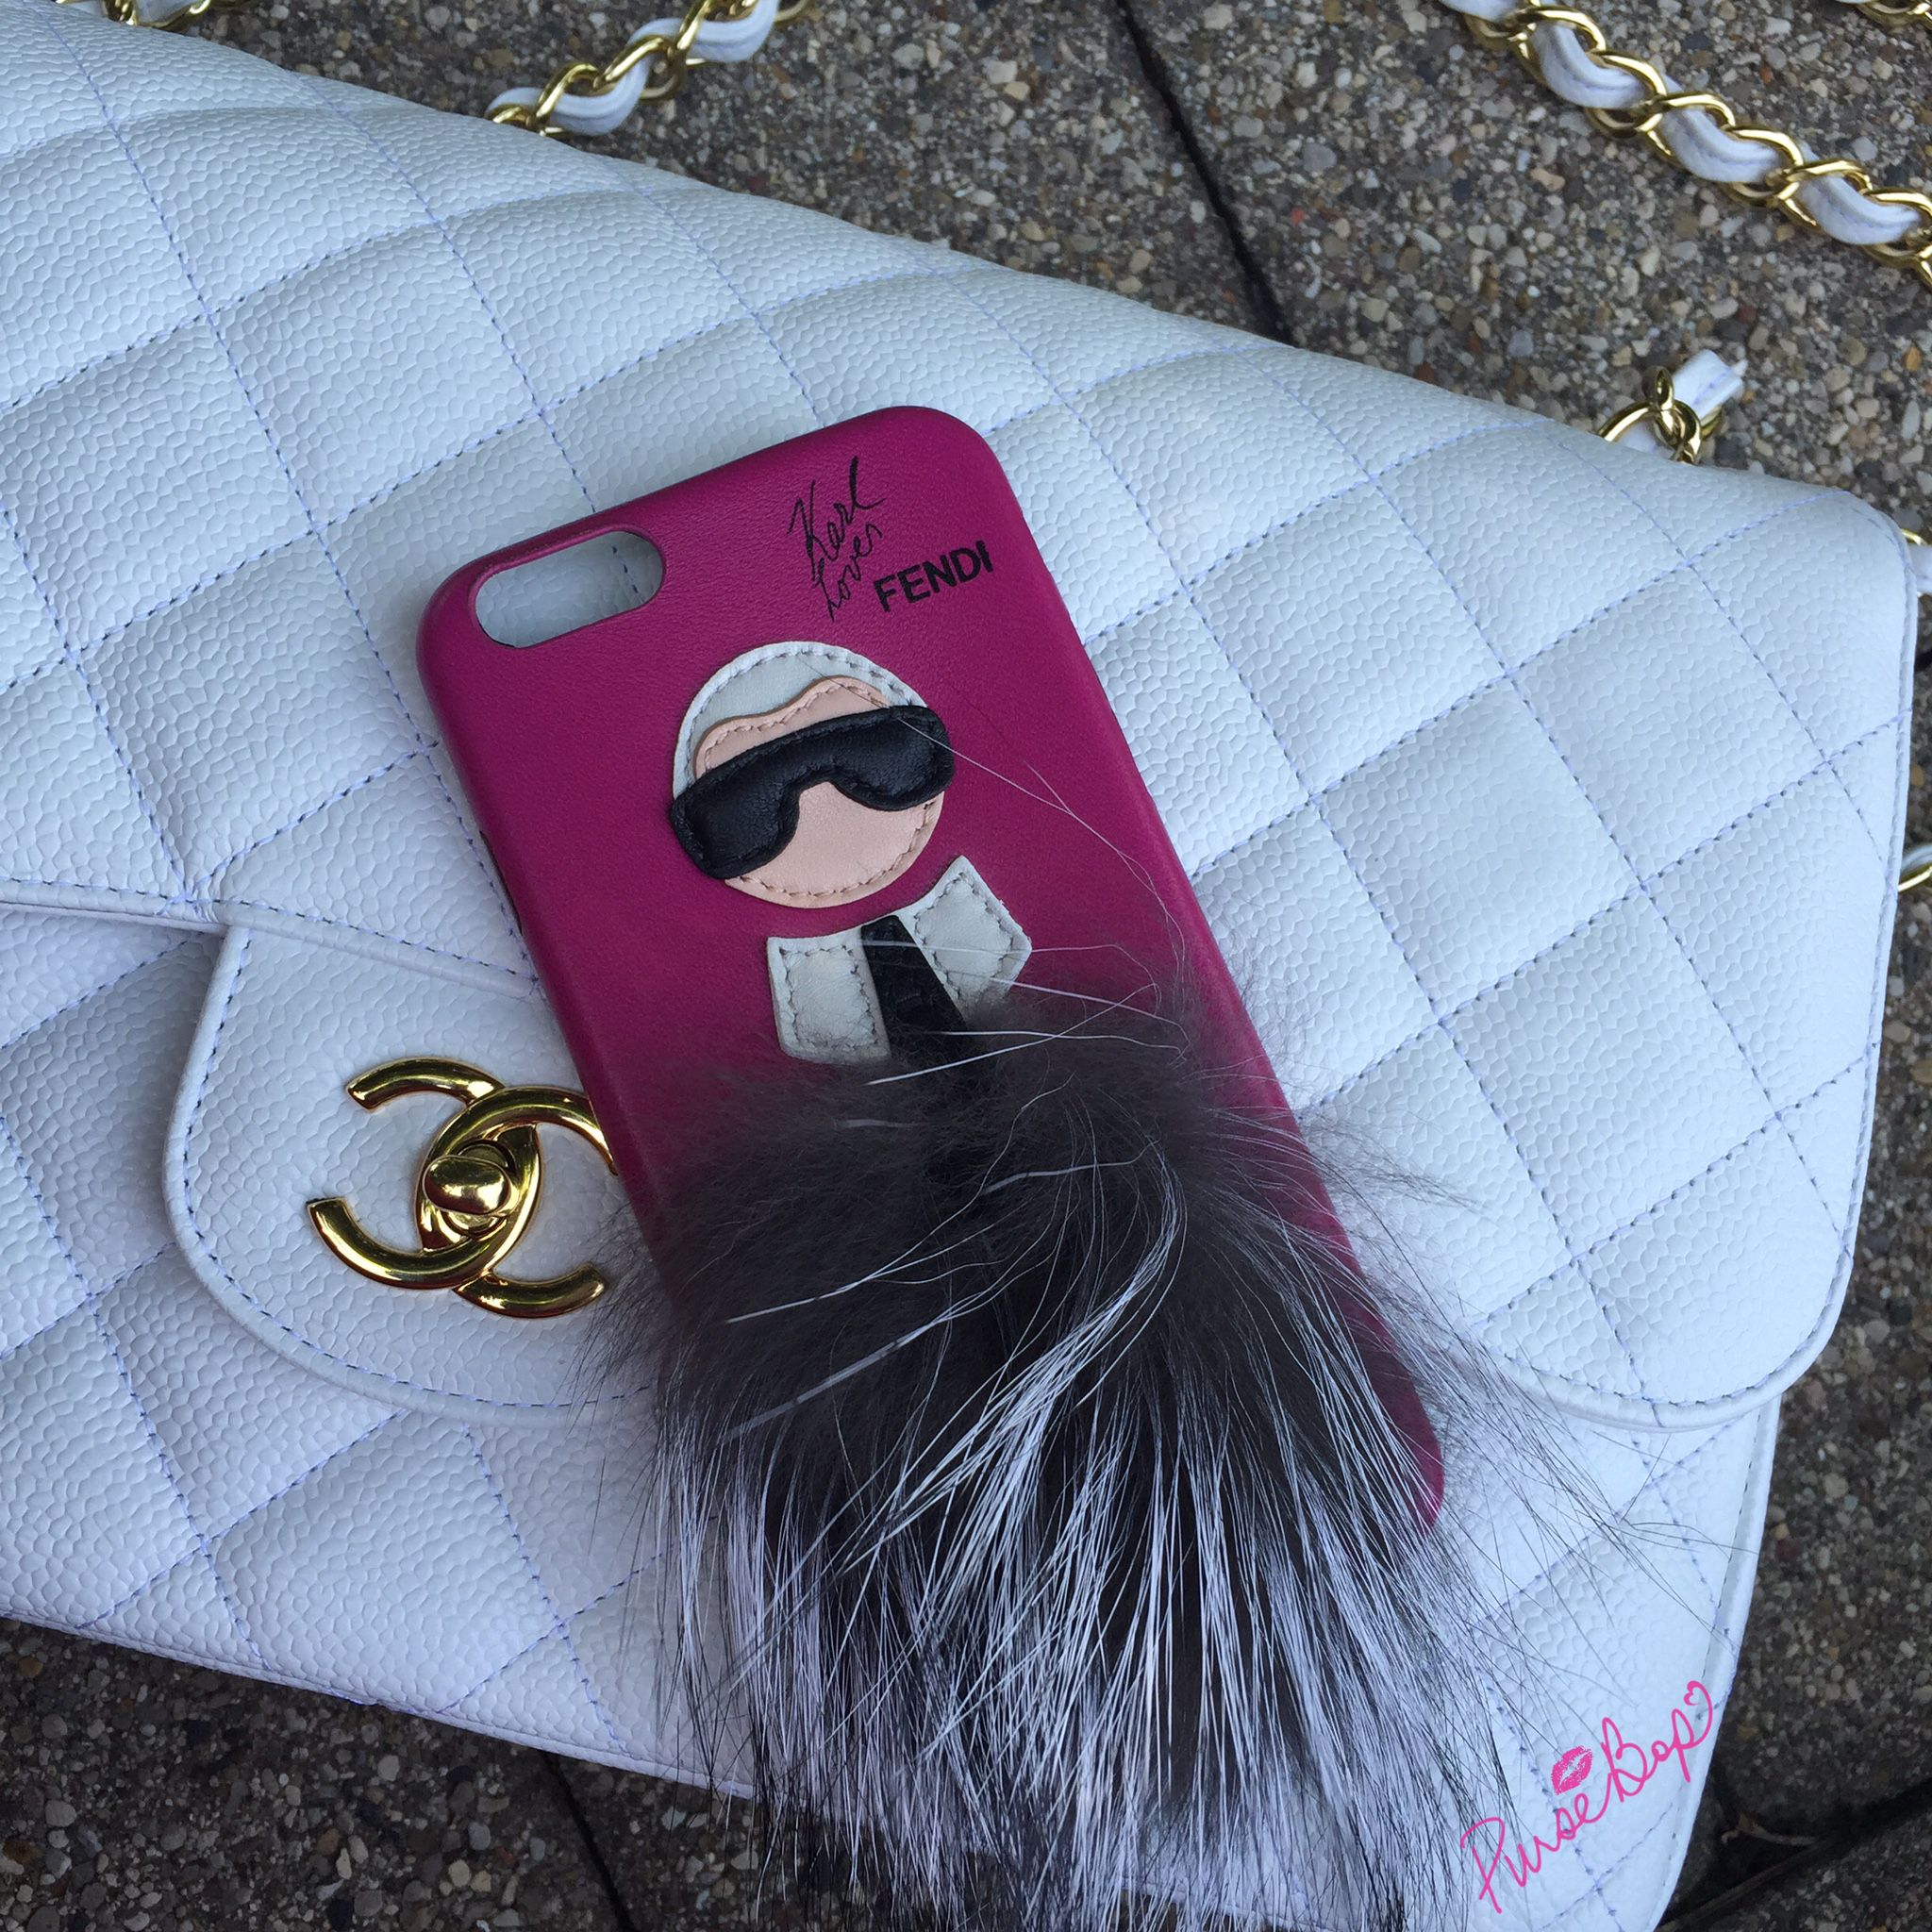 info for 89fbe 3edd2 Fendi Karlito iPhone Case Reveal